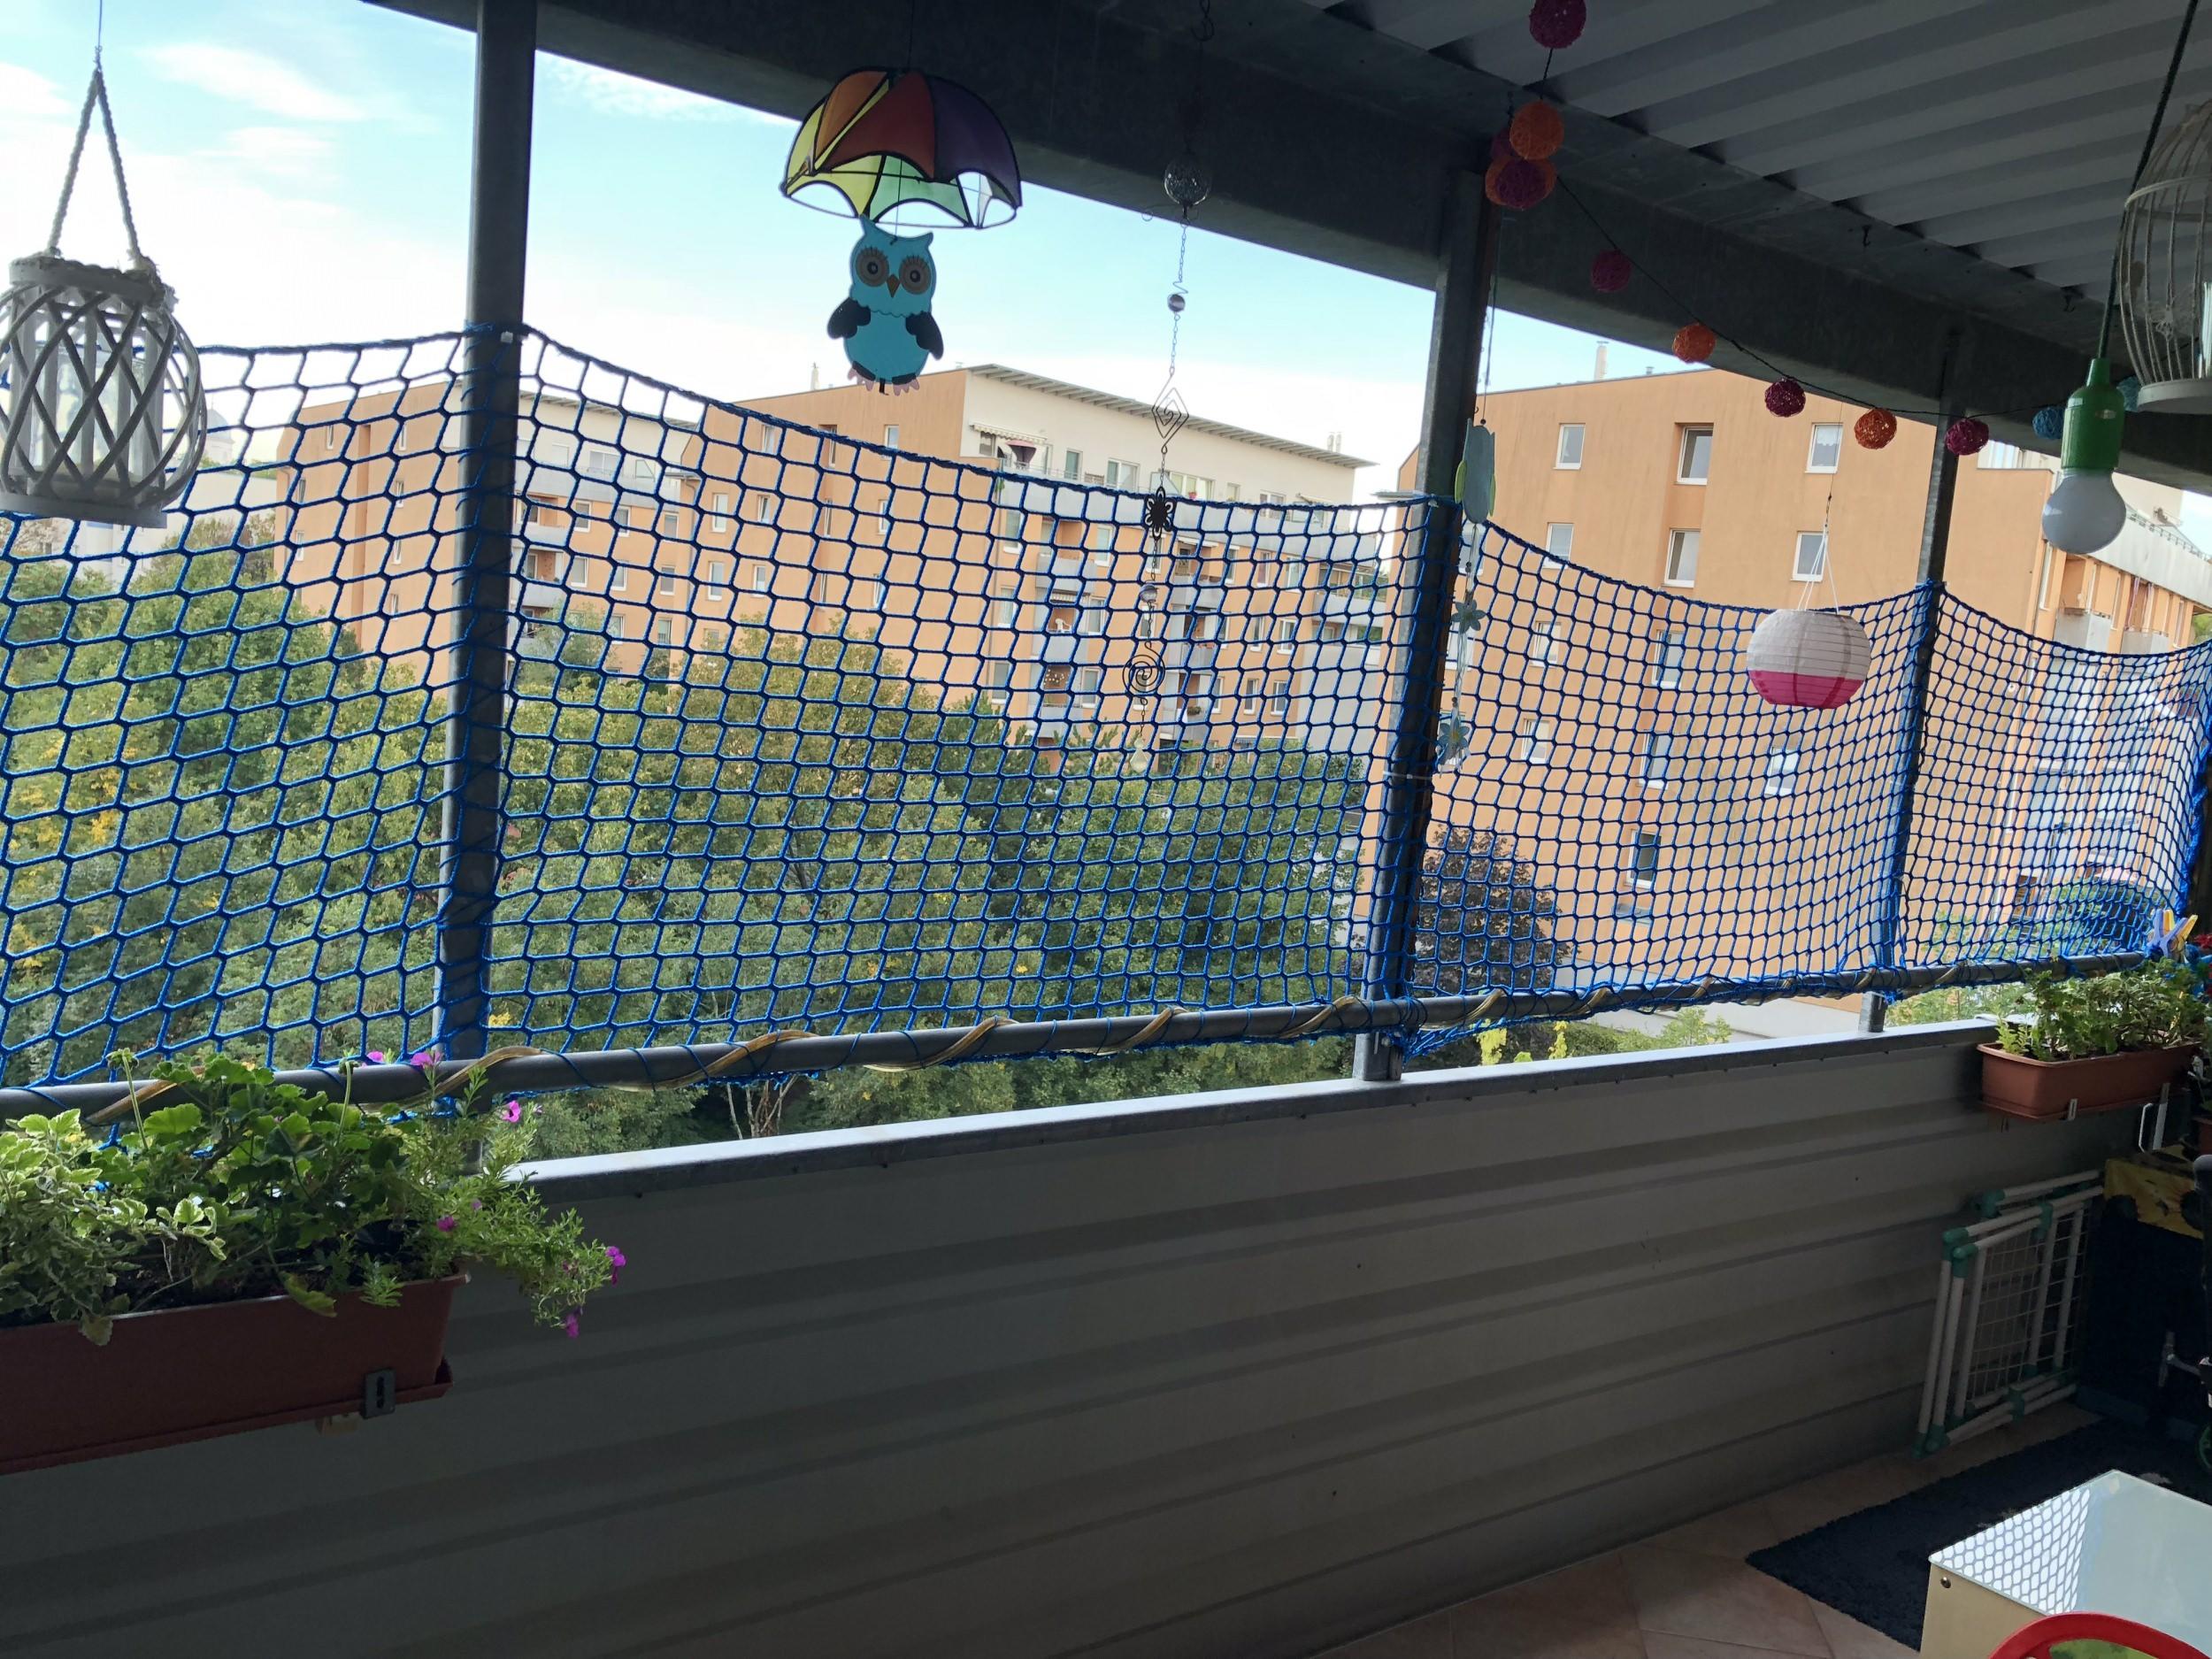 Balkon Sicherheitsnetze Per M Schutznetze24